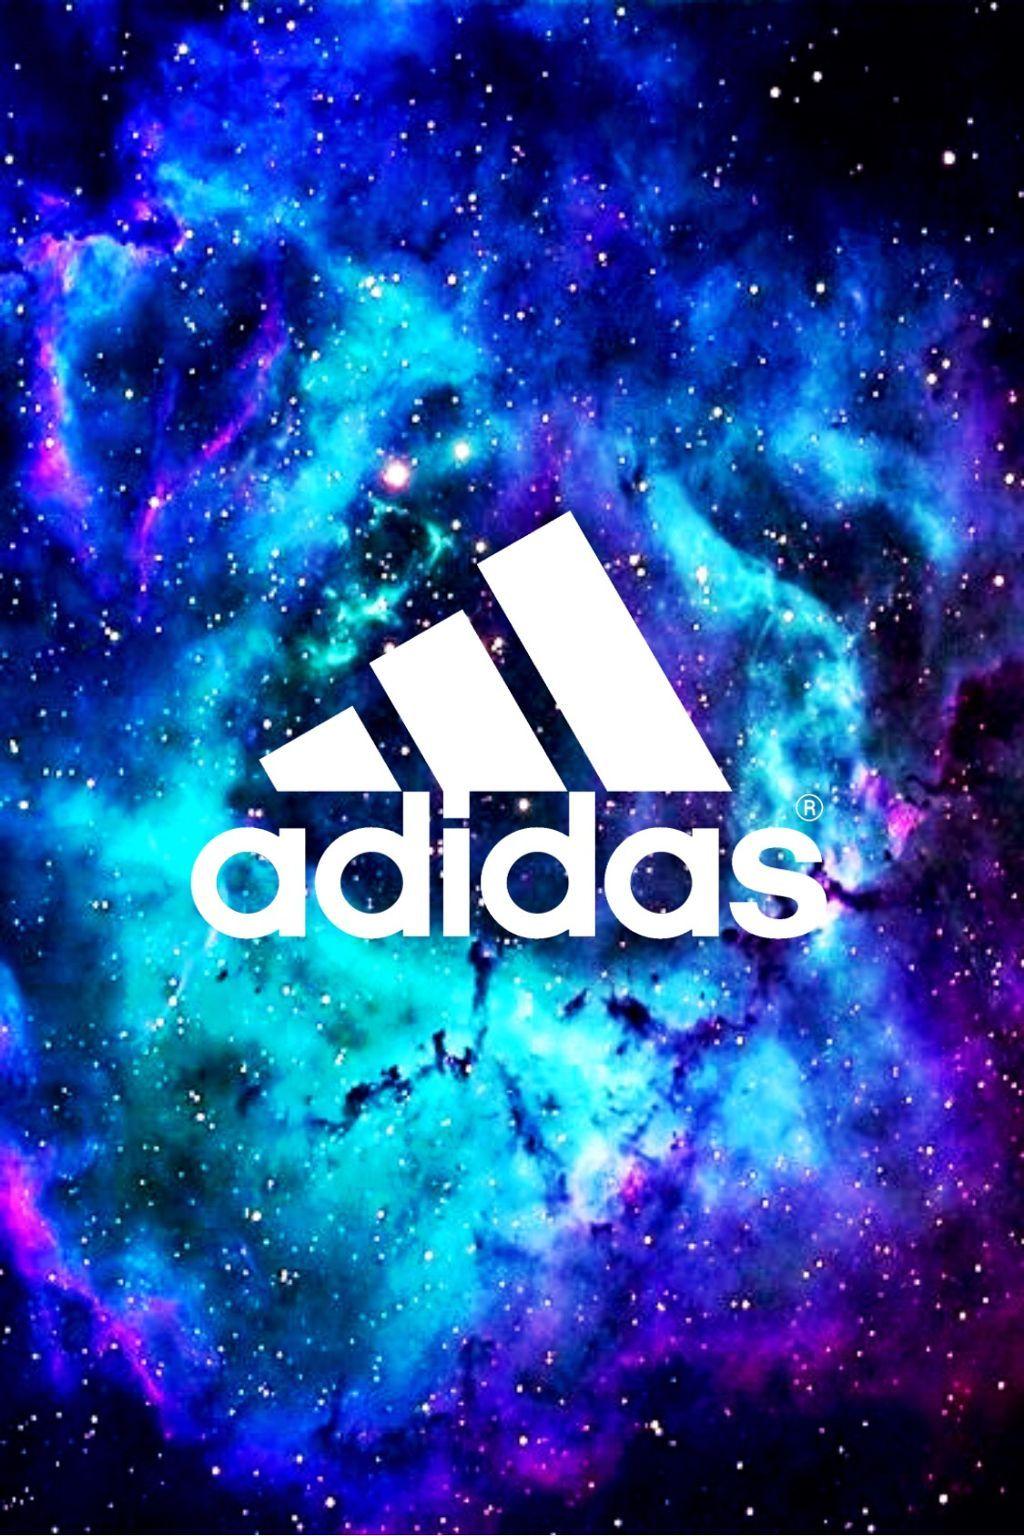 Galaxy Wallpaper Adidas Logo 2854491 Hd Wallpaper Backgrounds Download